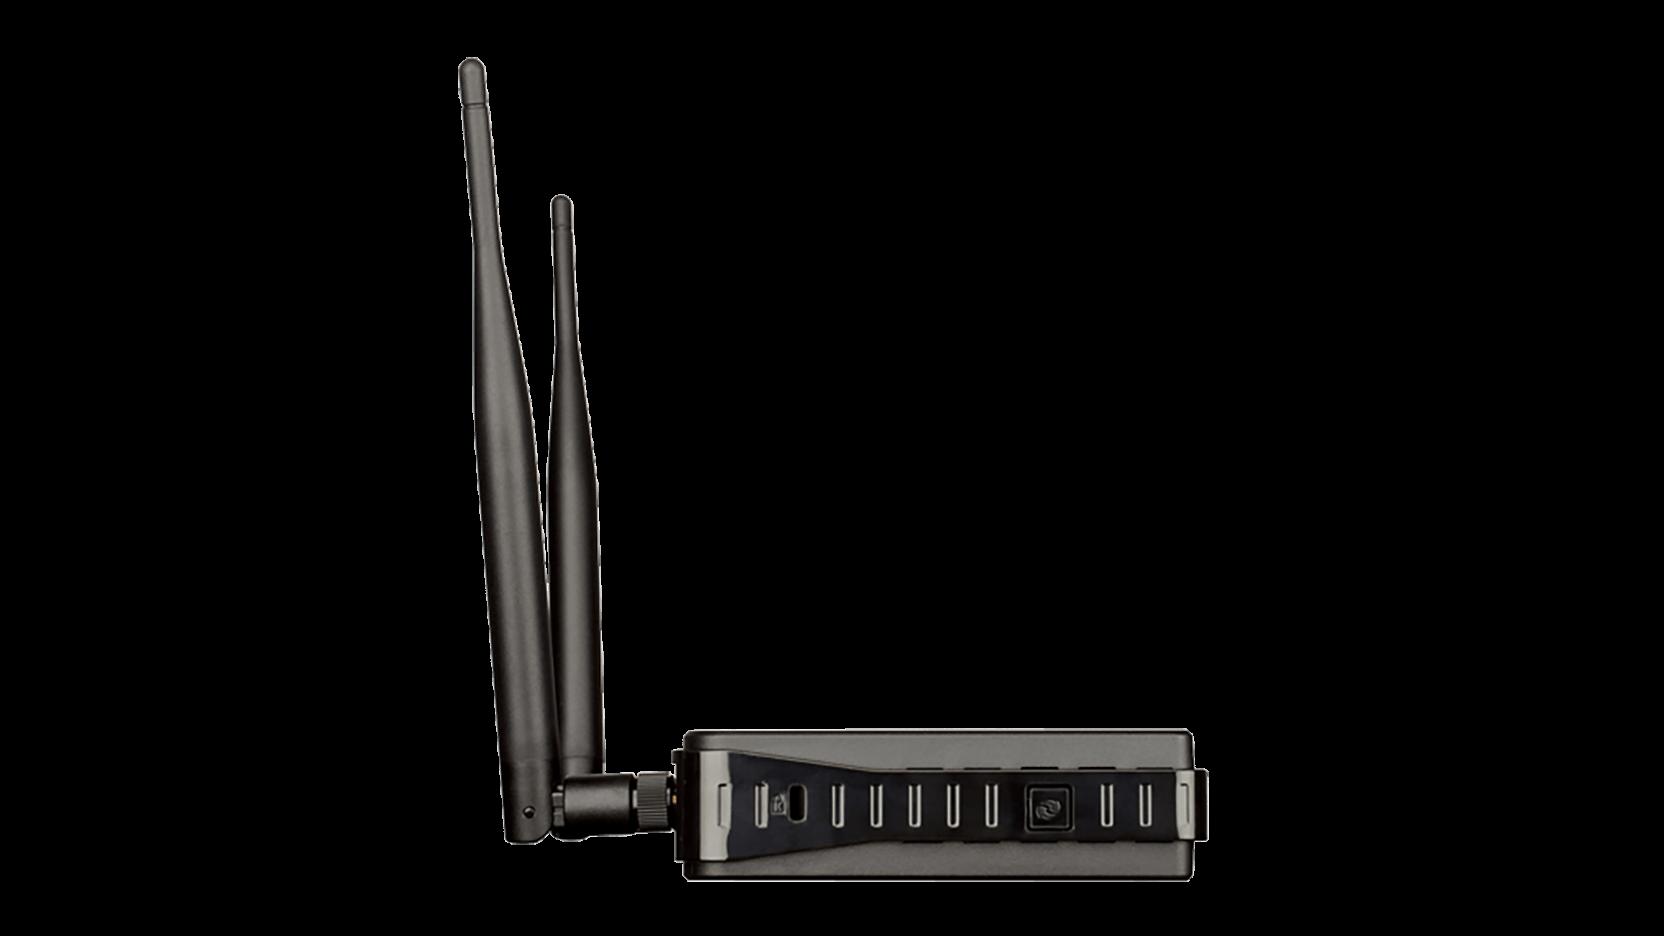 Dap 1360 Punto De Acceso Wireless N De C Digo Abierto D